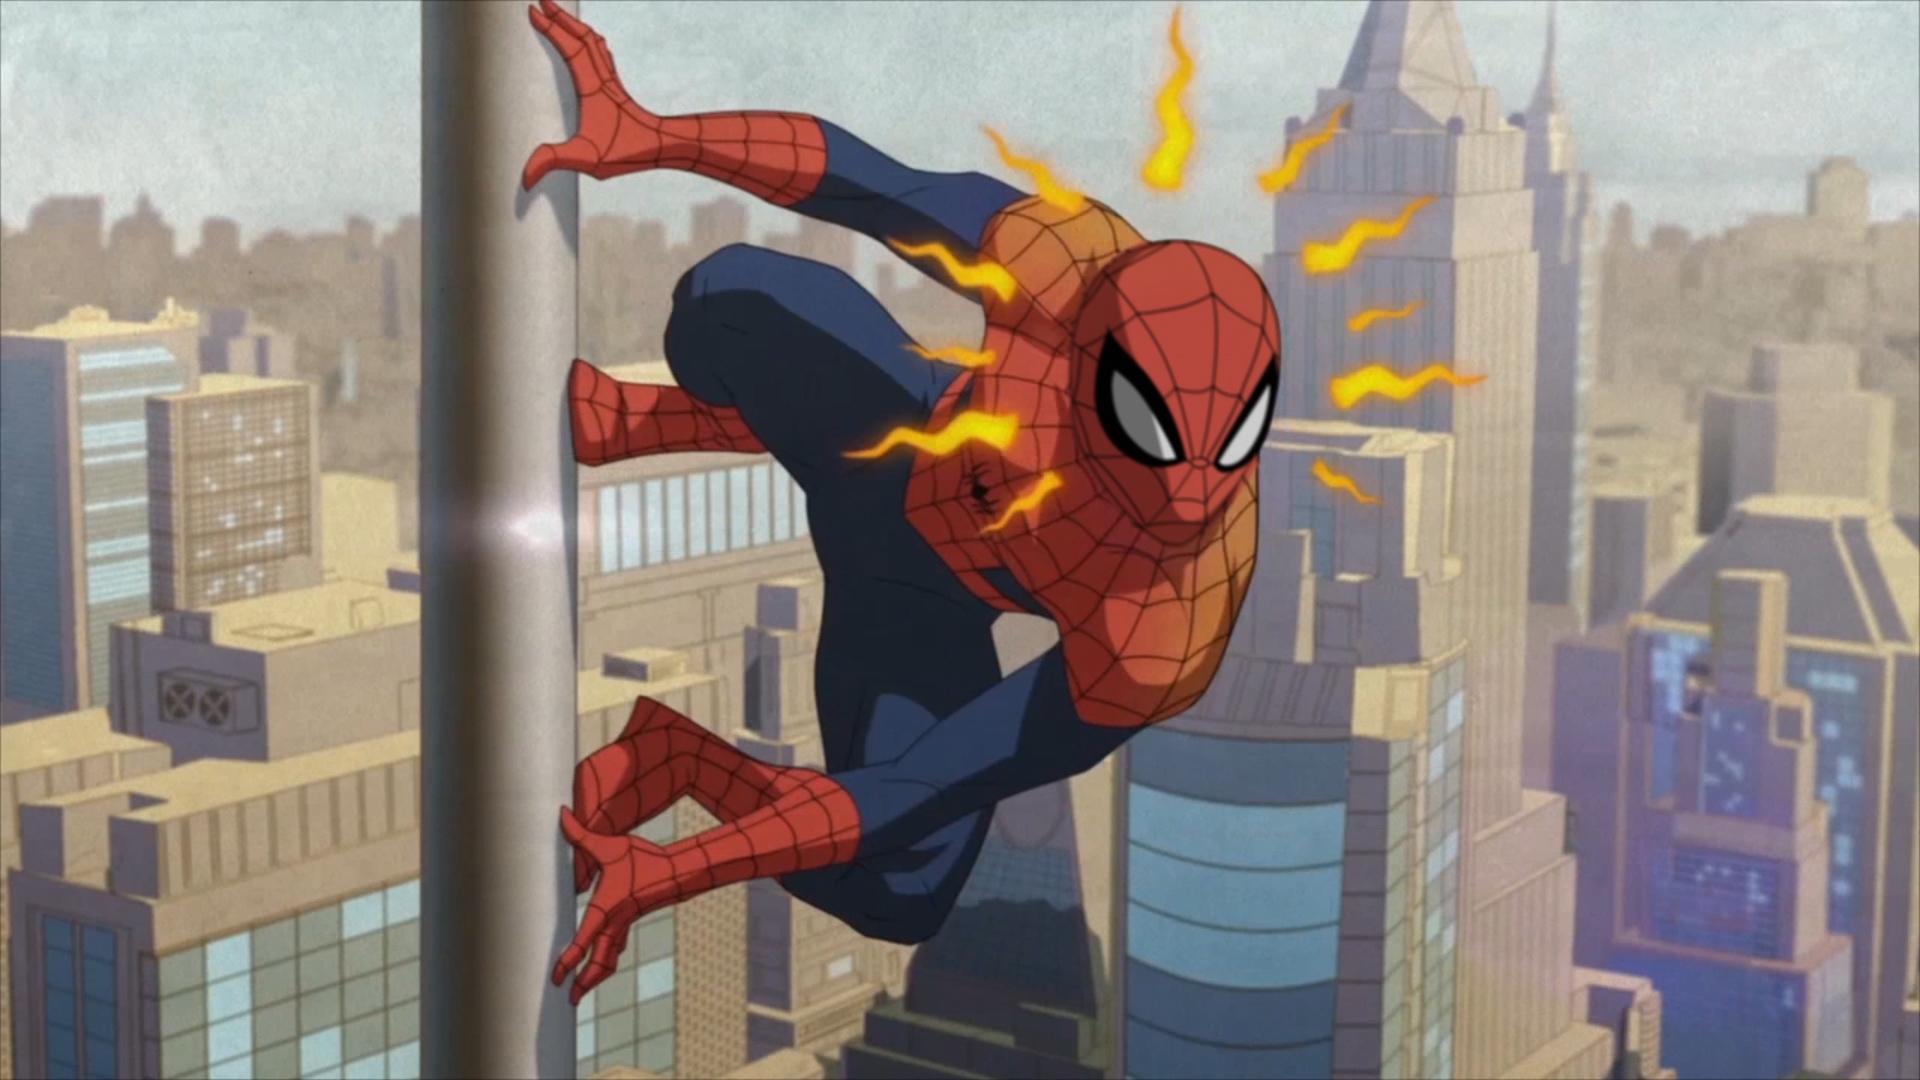 Spider-Man Be Inspired PSA